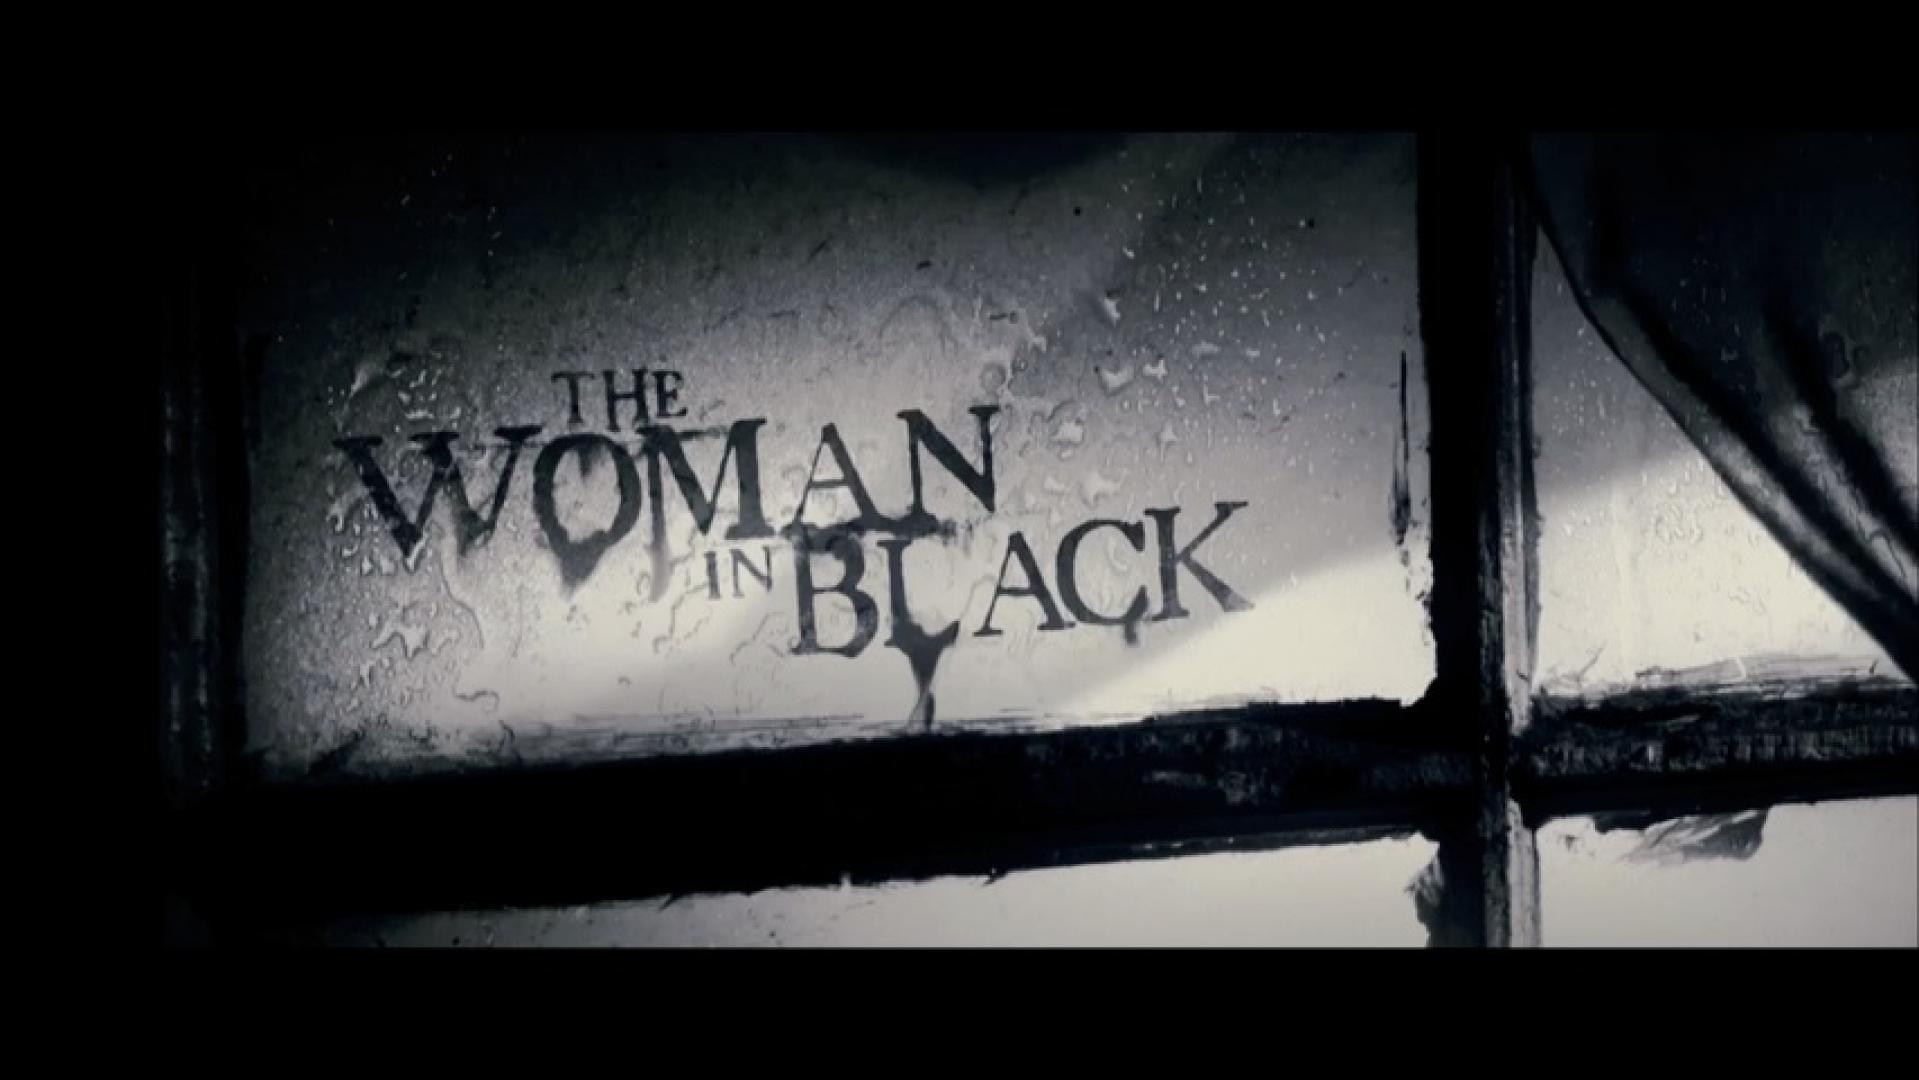 The Woman in Black - A fekete ruhás nő (2012)